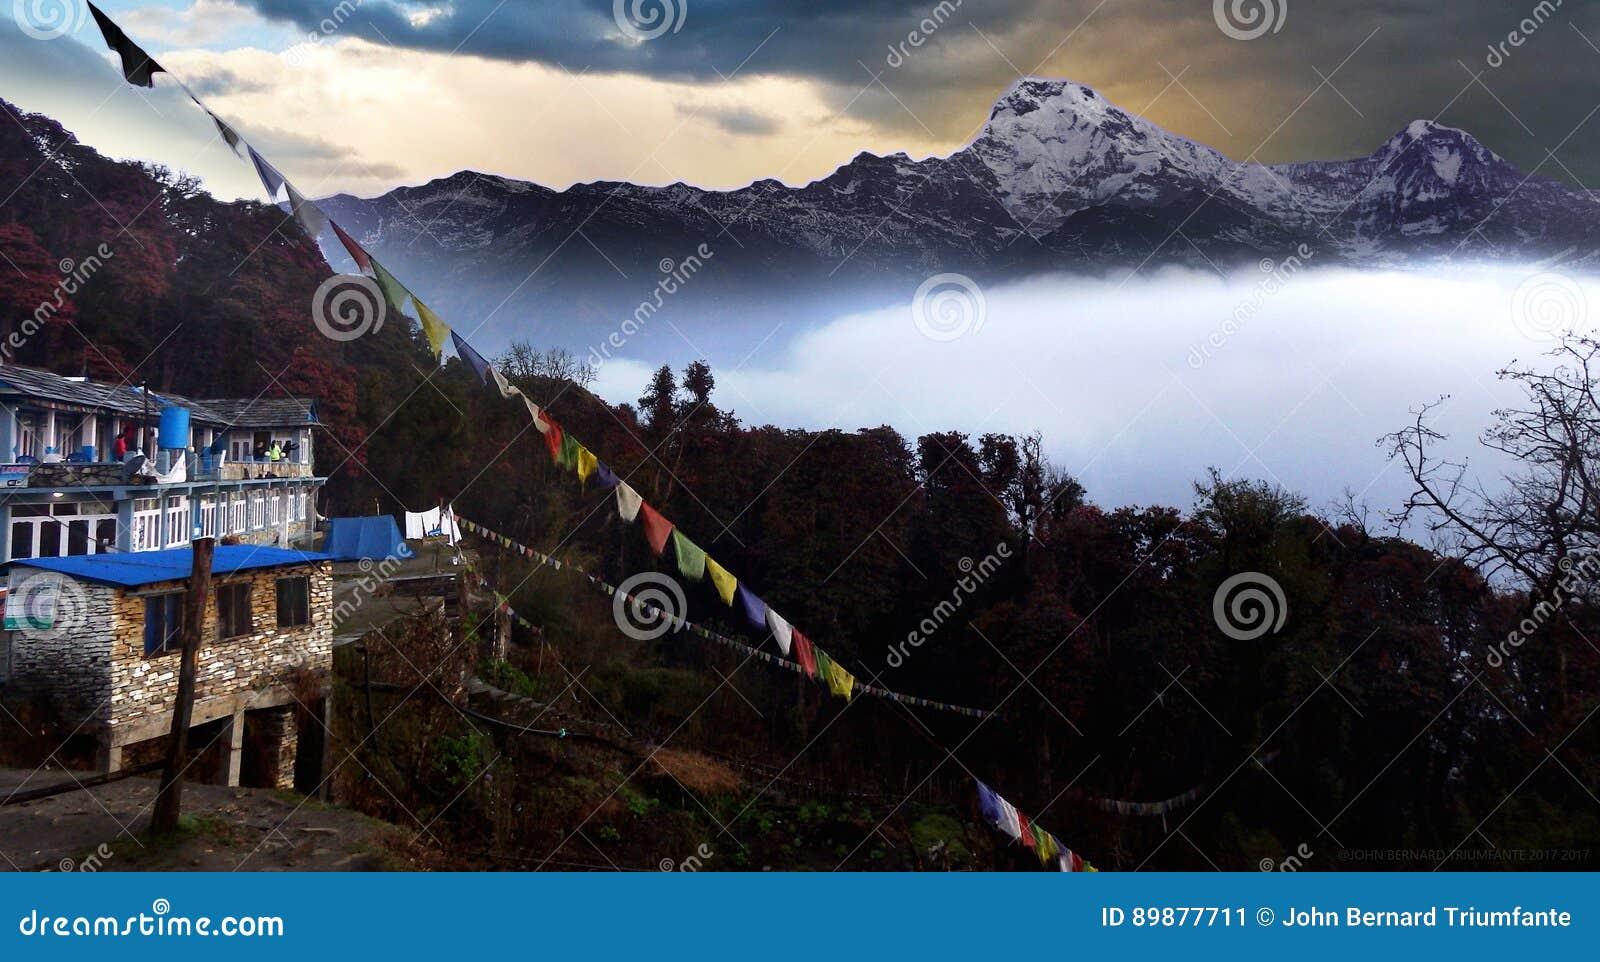 Annapurna Mountain Range view from Tadapani